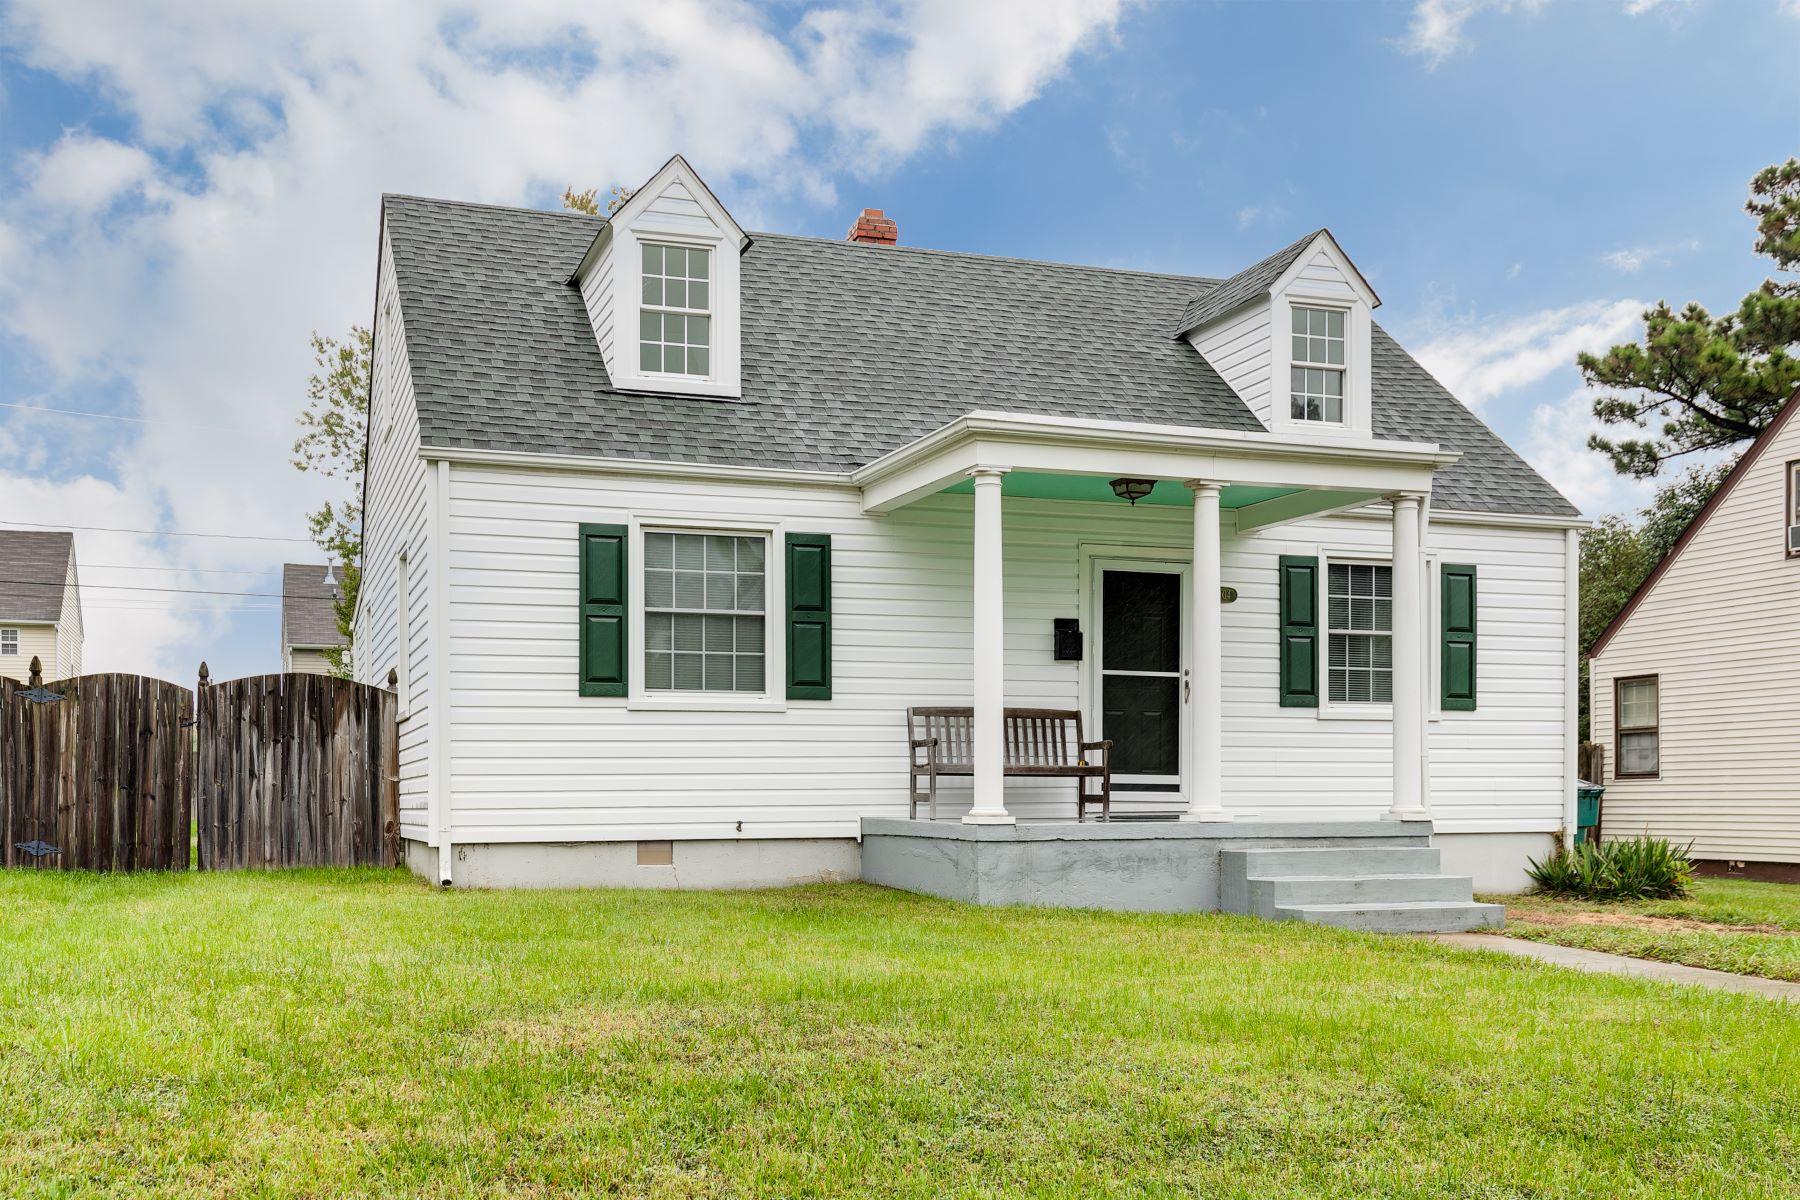 Single Family Homes for Sale at 7004 Tulane Avenue, Henrico, Va, 23226 Henrico, Virginia 23226 United States